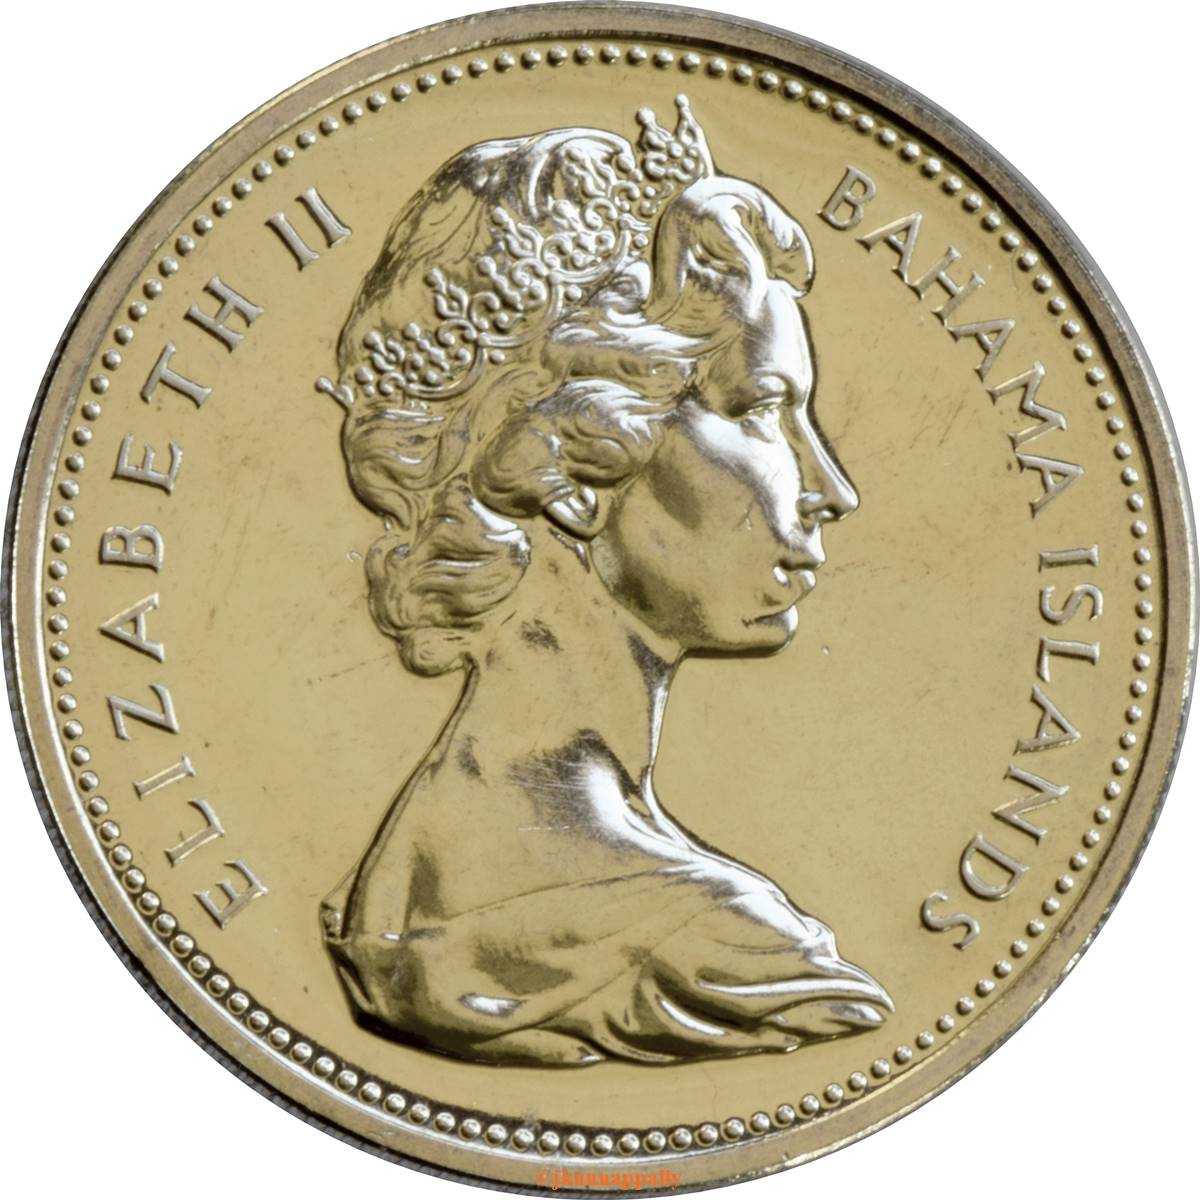 57h Coins 25 Cents Queen Elizabeth Ii 1966 Bahamas